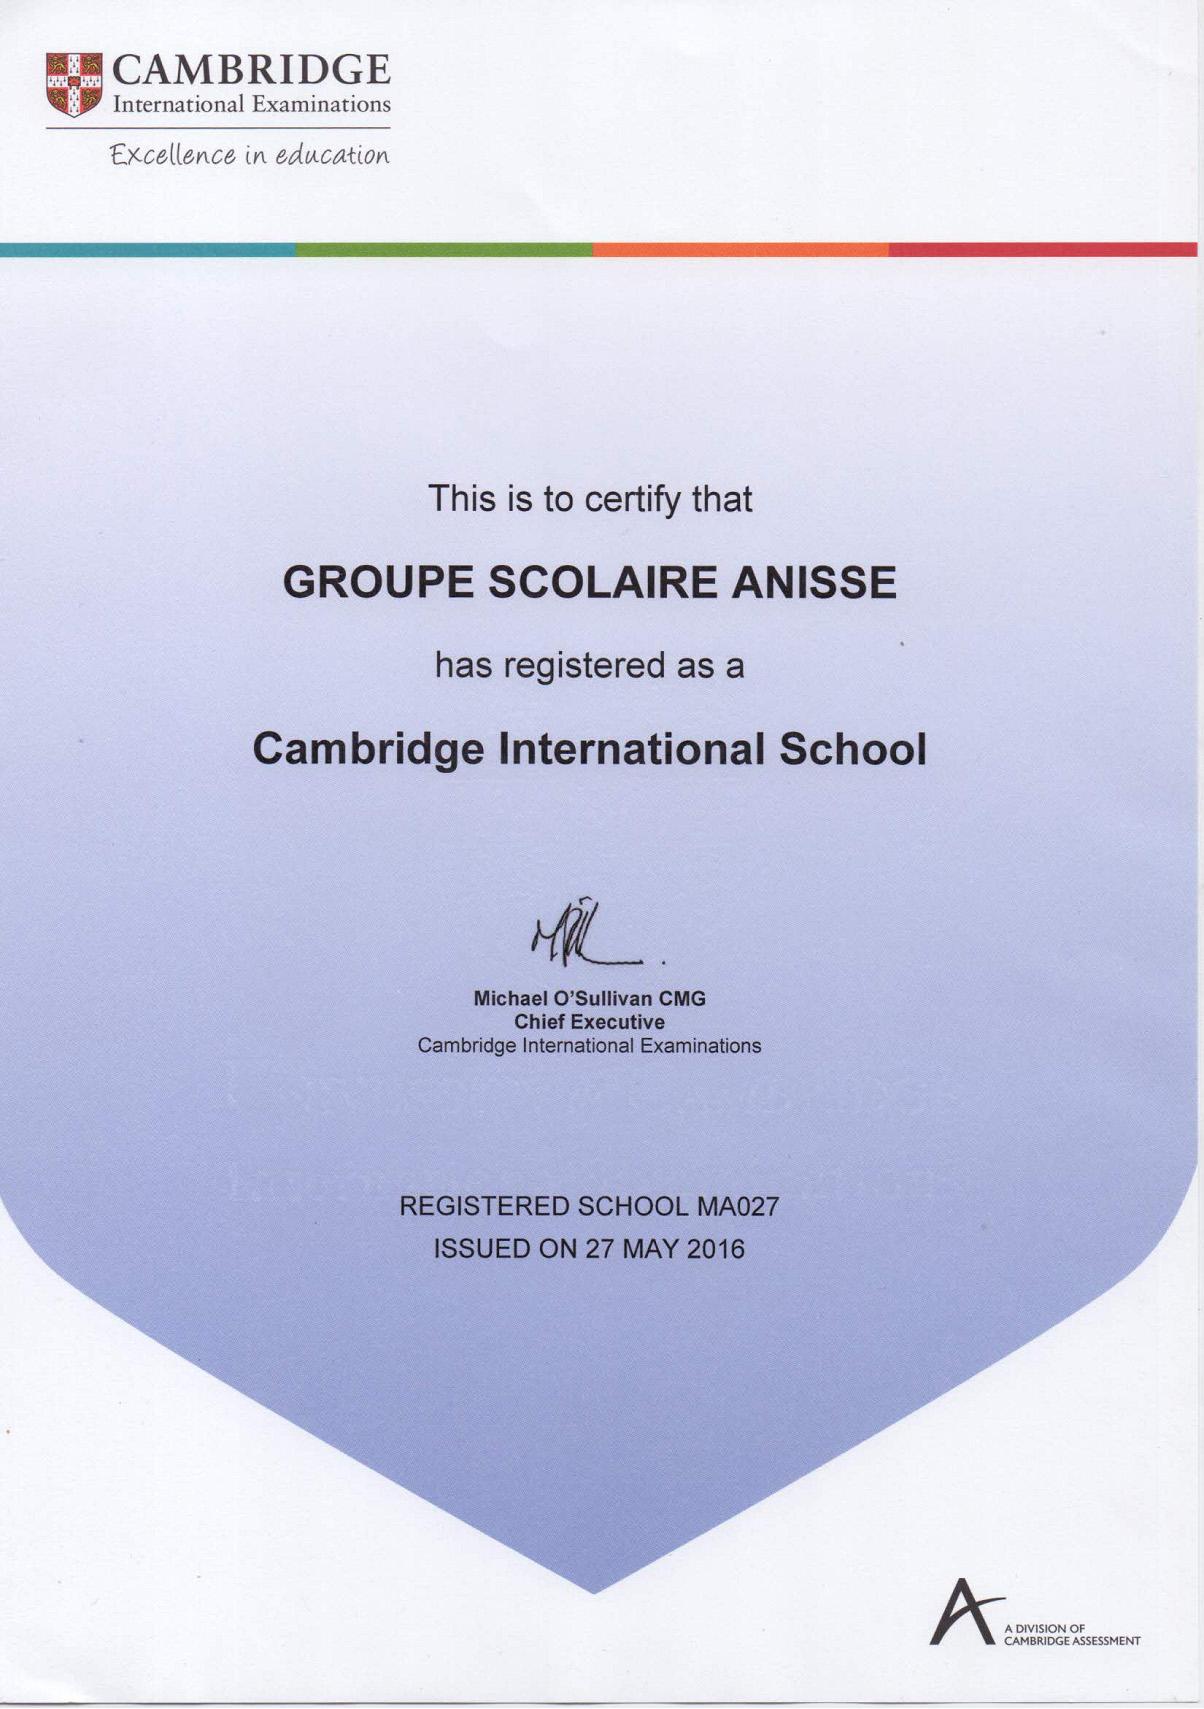 Gsa cambridge International Examinations